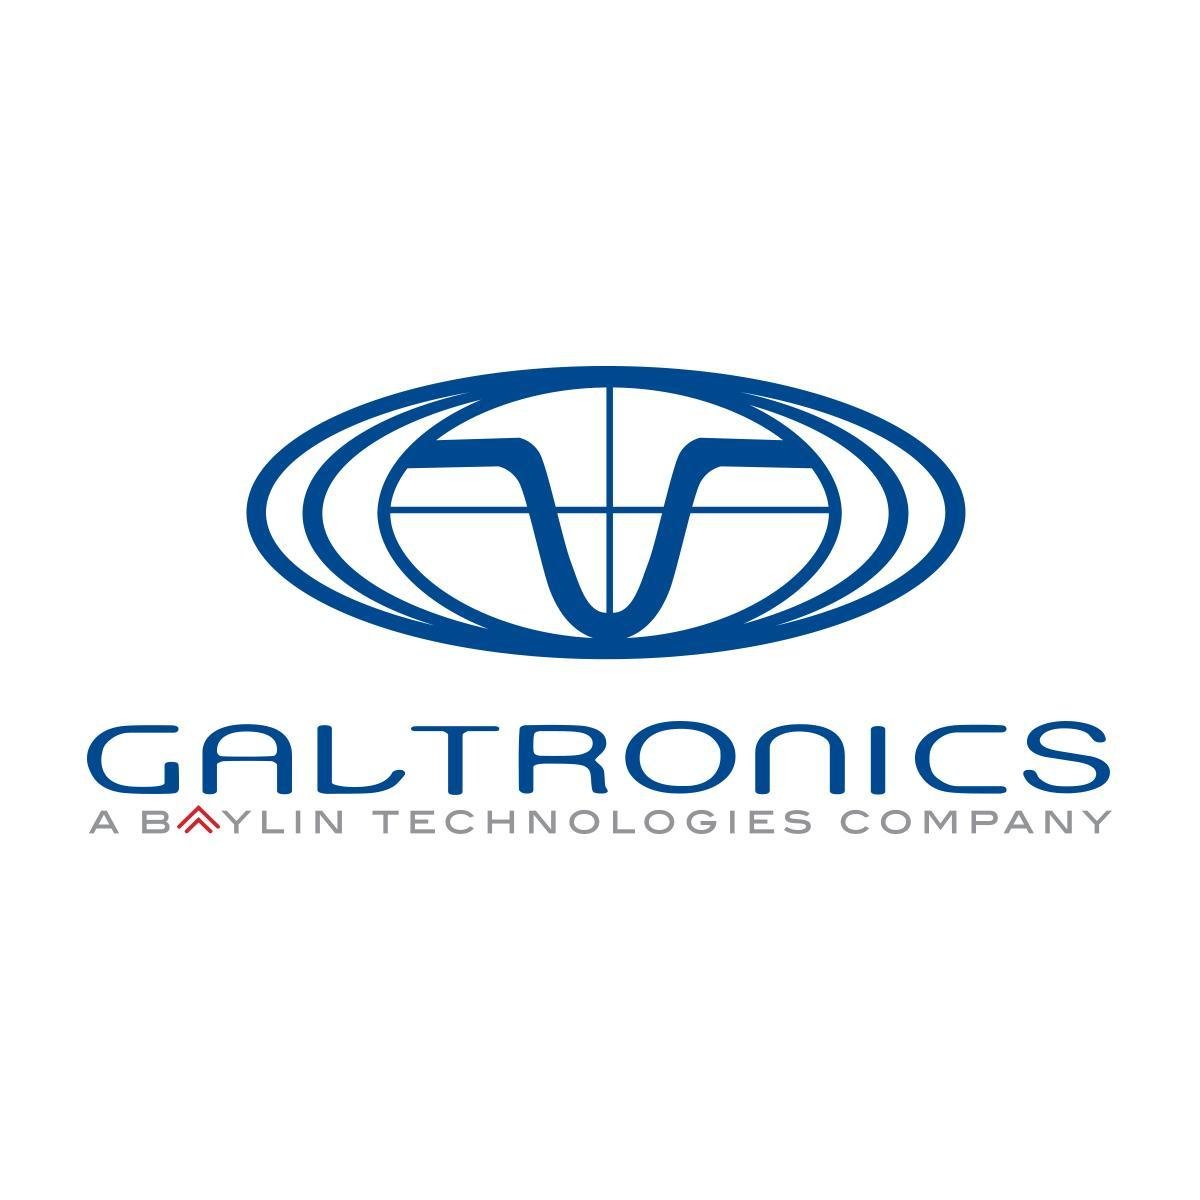 Galtronics